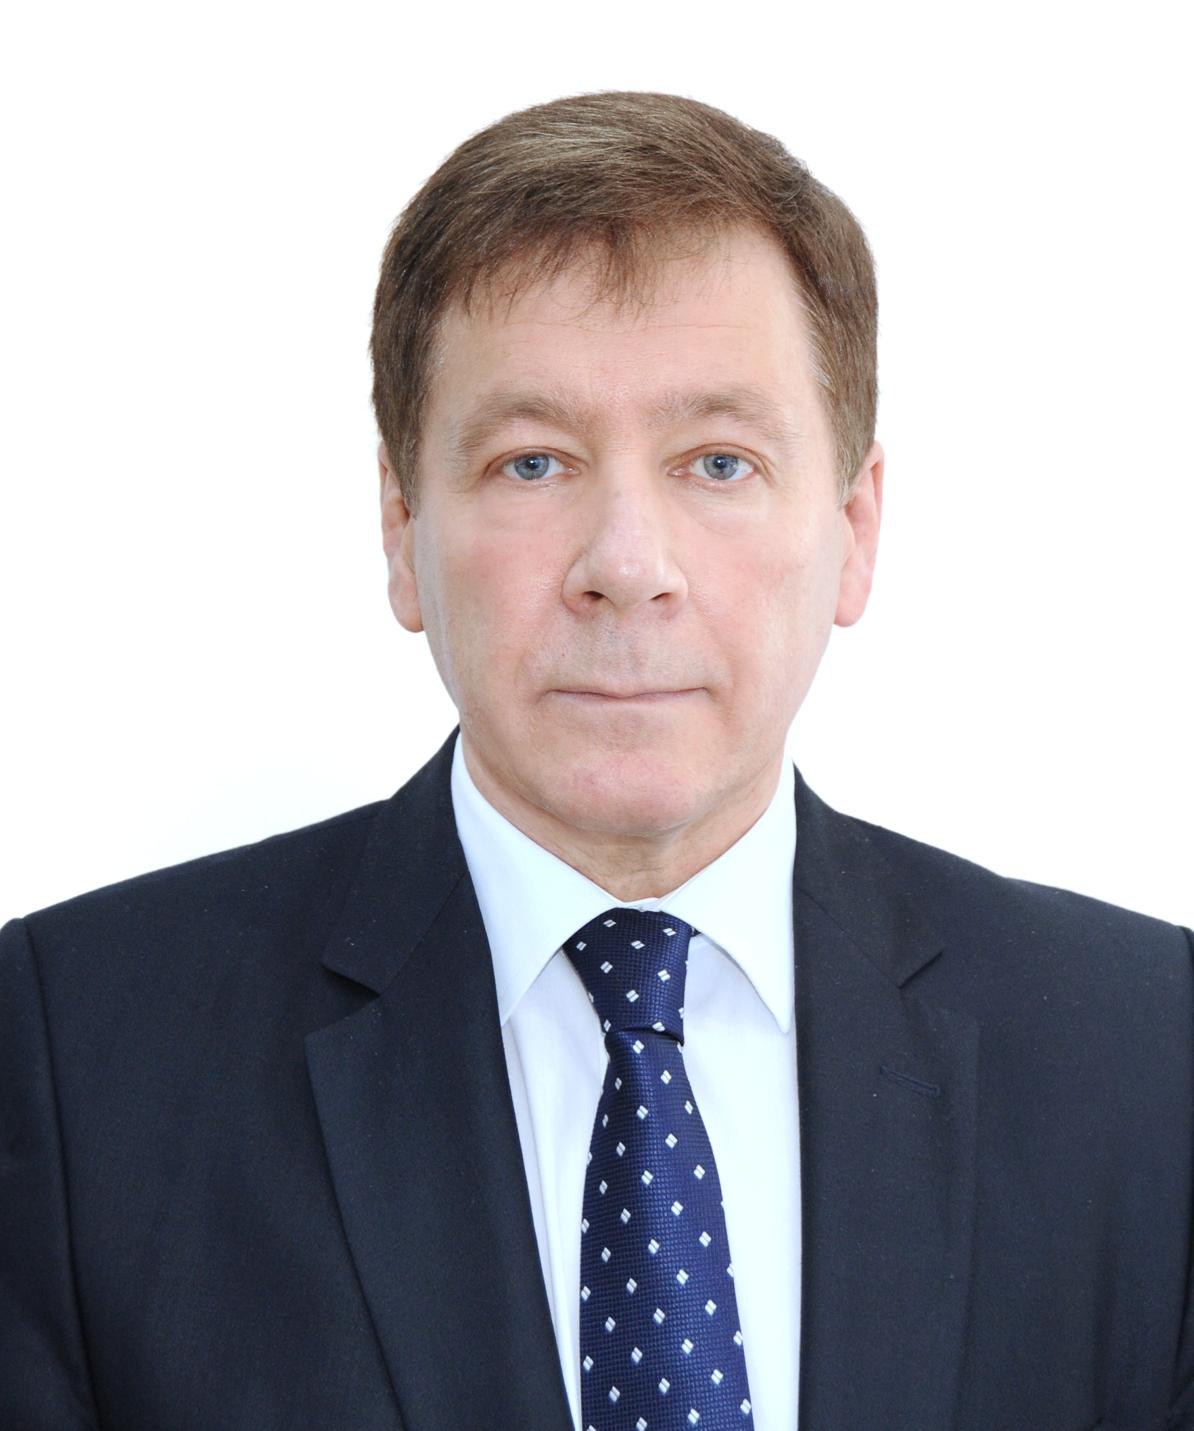 Ambassador of Ukraine happy with mission in Vietnam